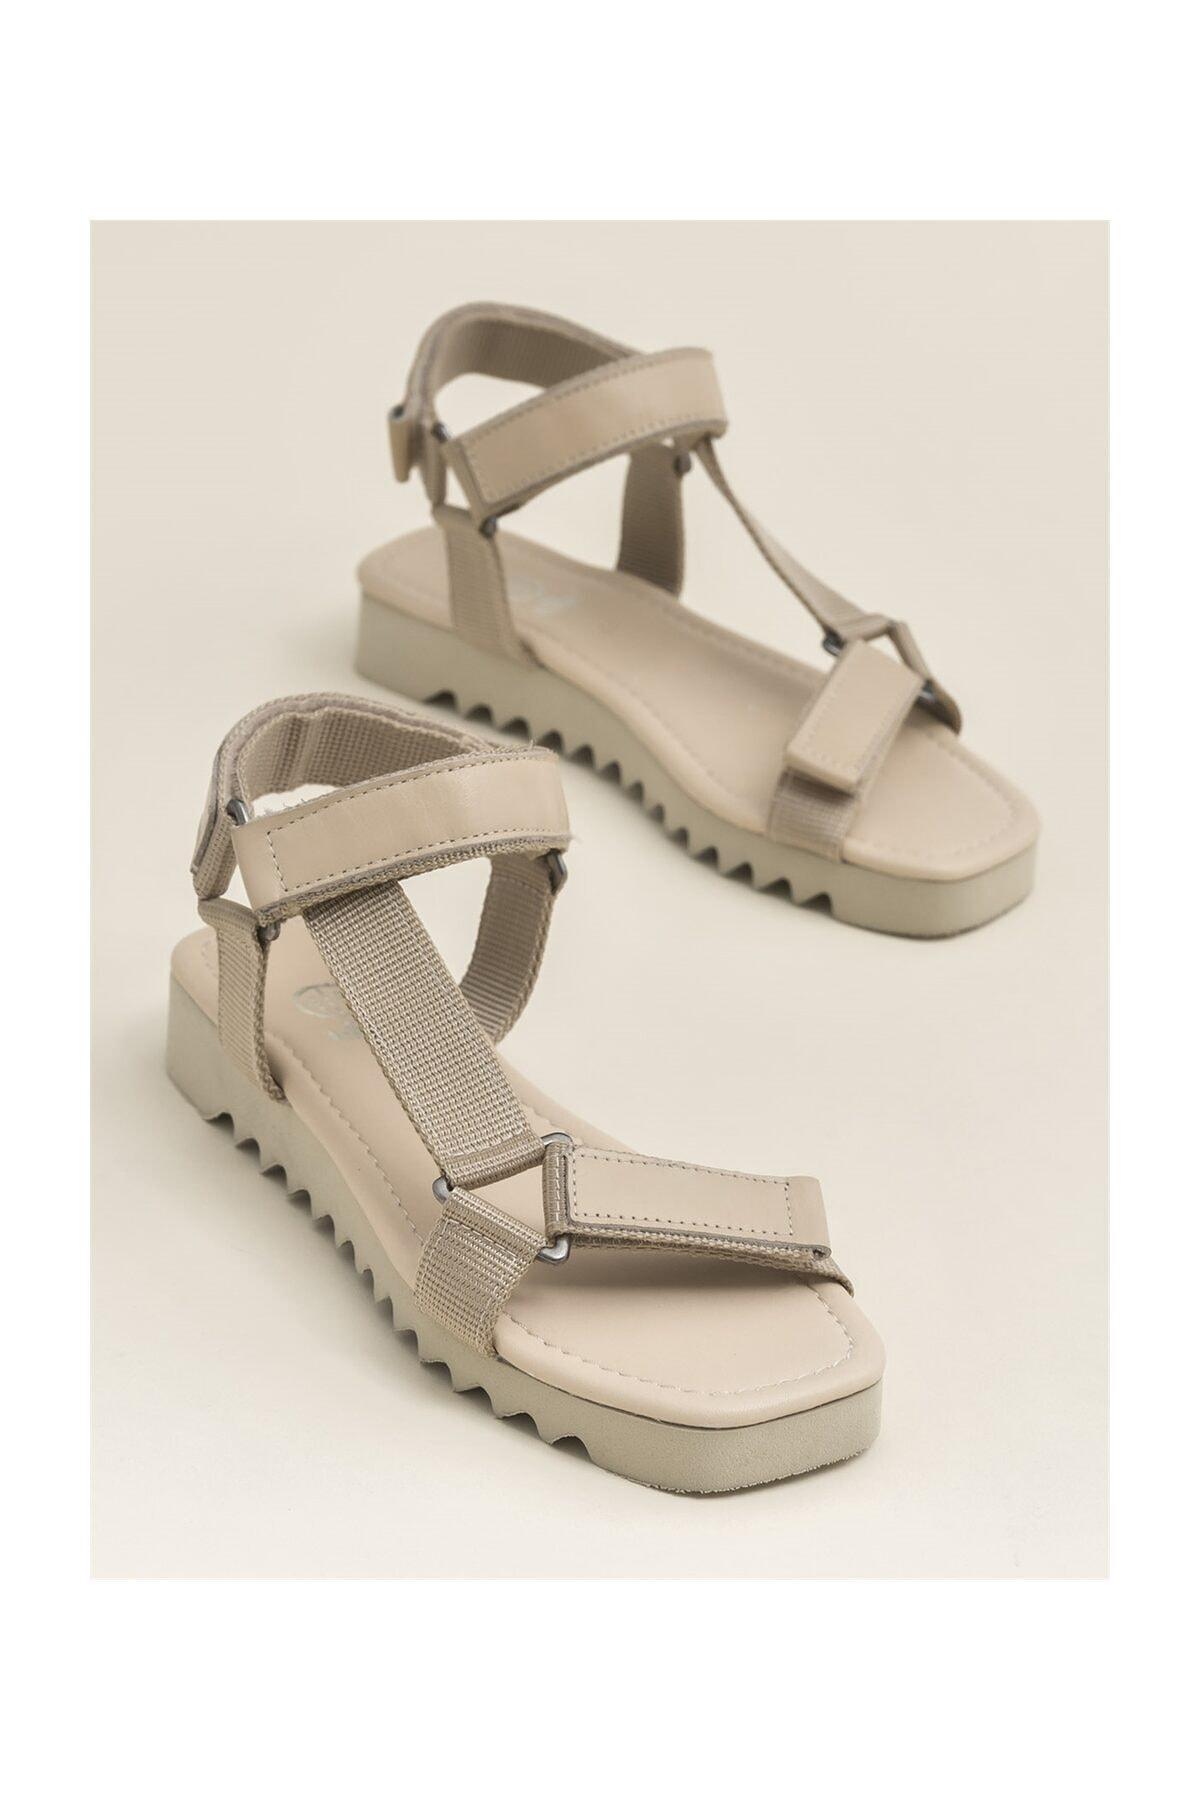 Elle Shoes Tammara Kadın Sandalet 1